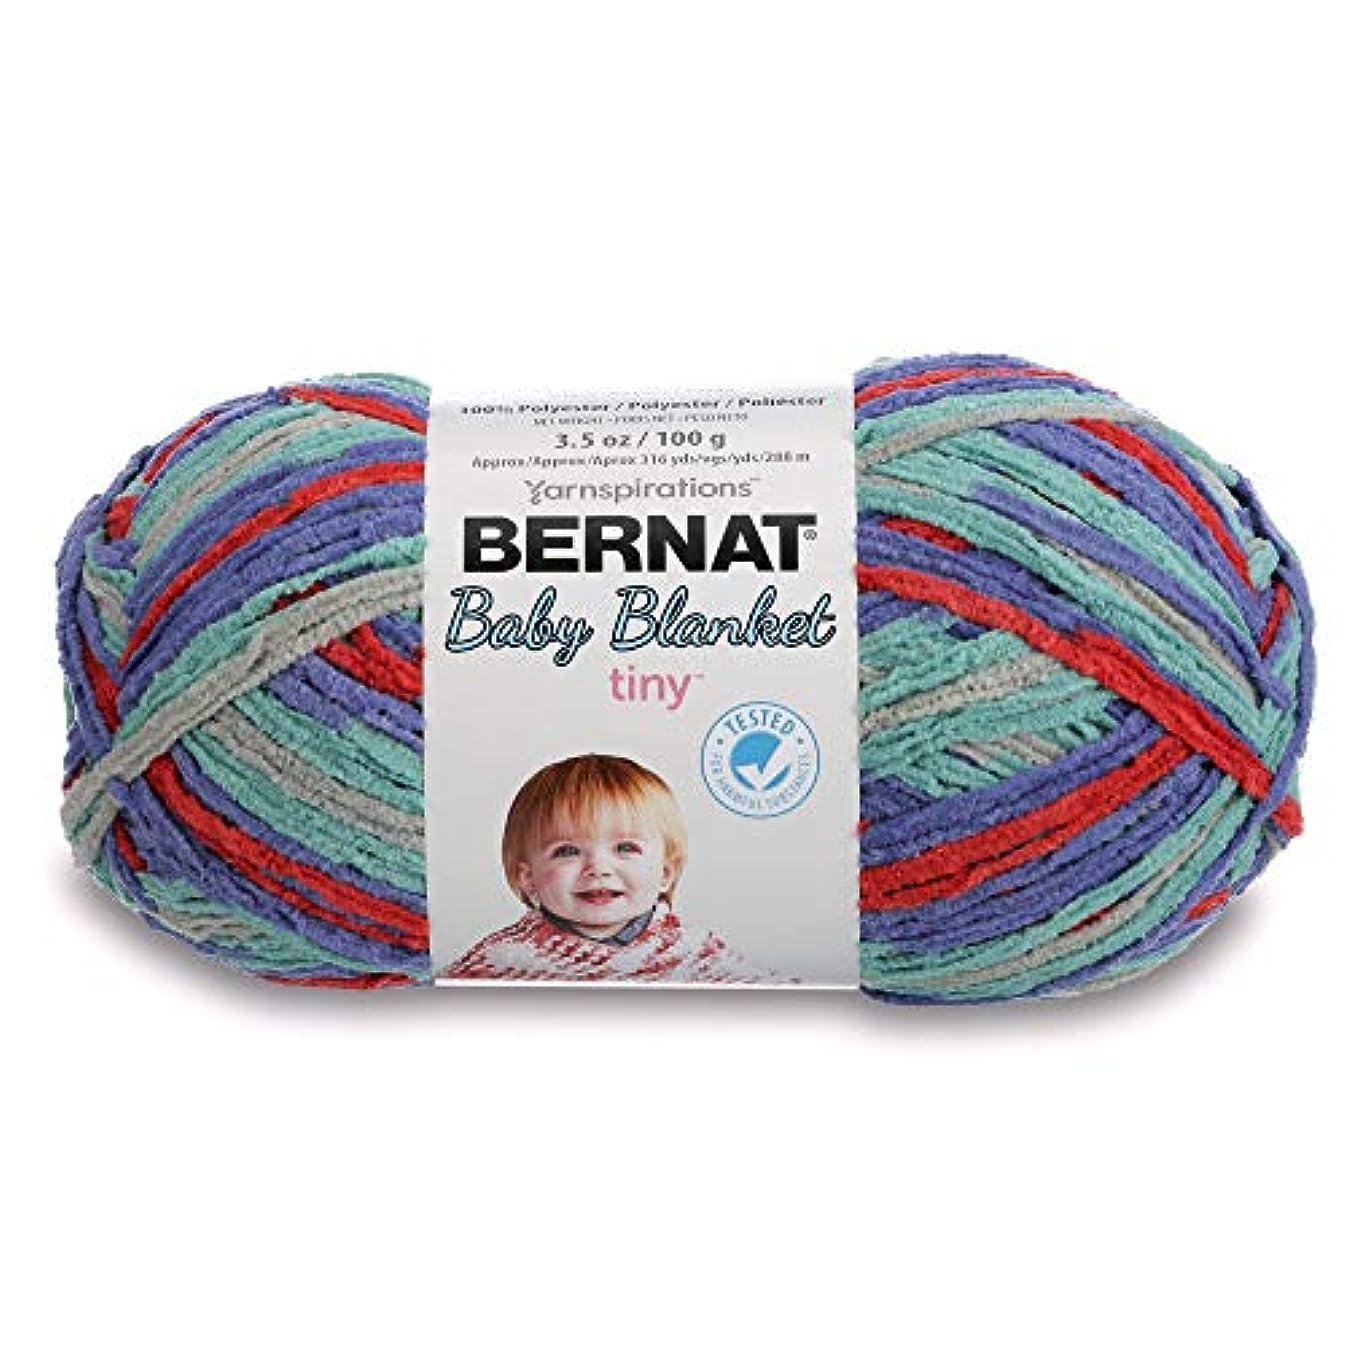 Bernat Baby Blanket Tiny Yarn, 3.5 oz, Gauge 4 Medium, Calico Quilt